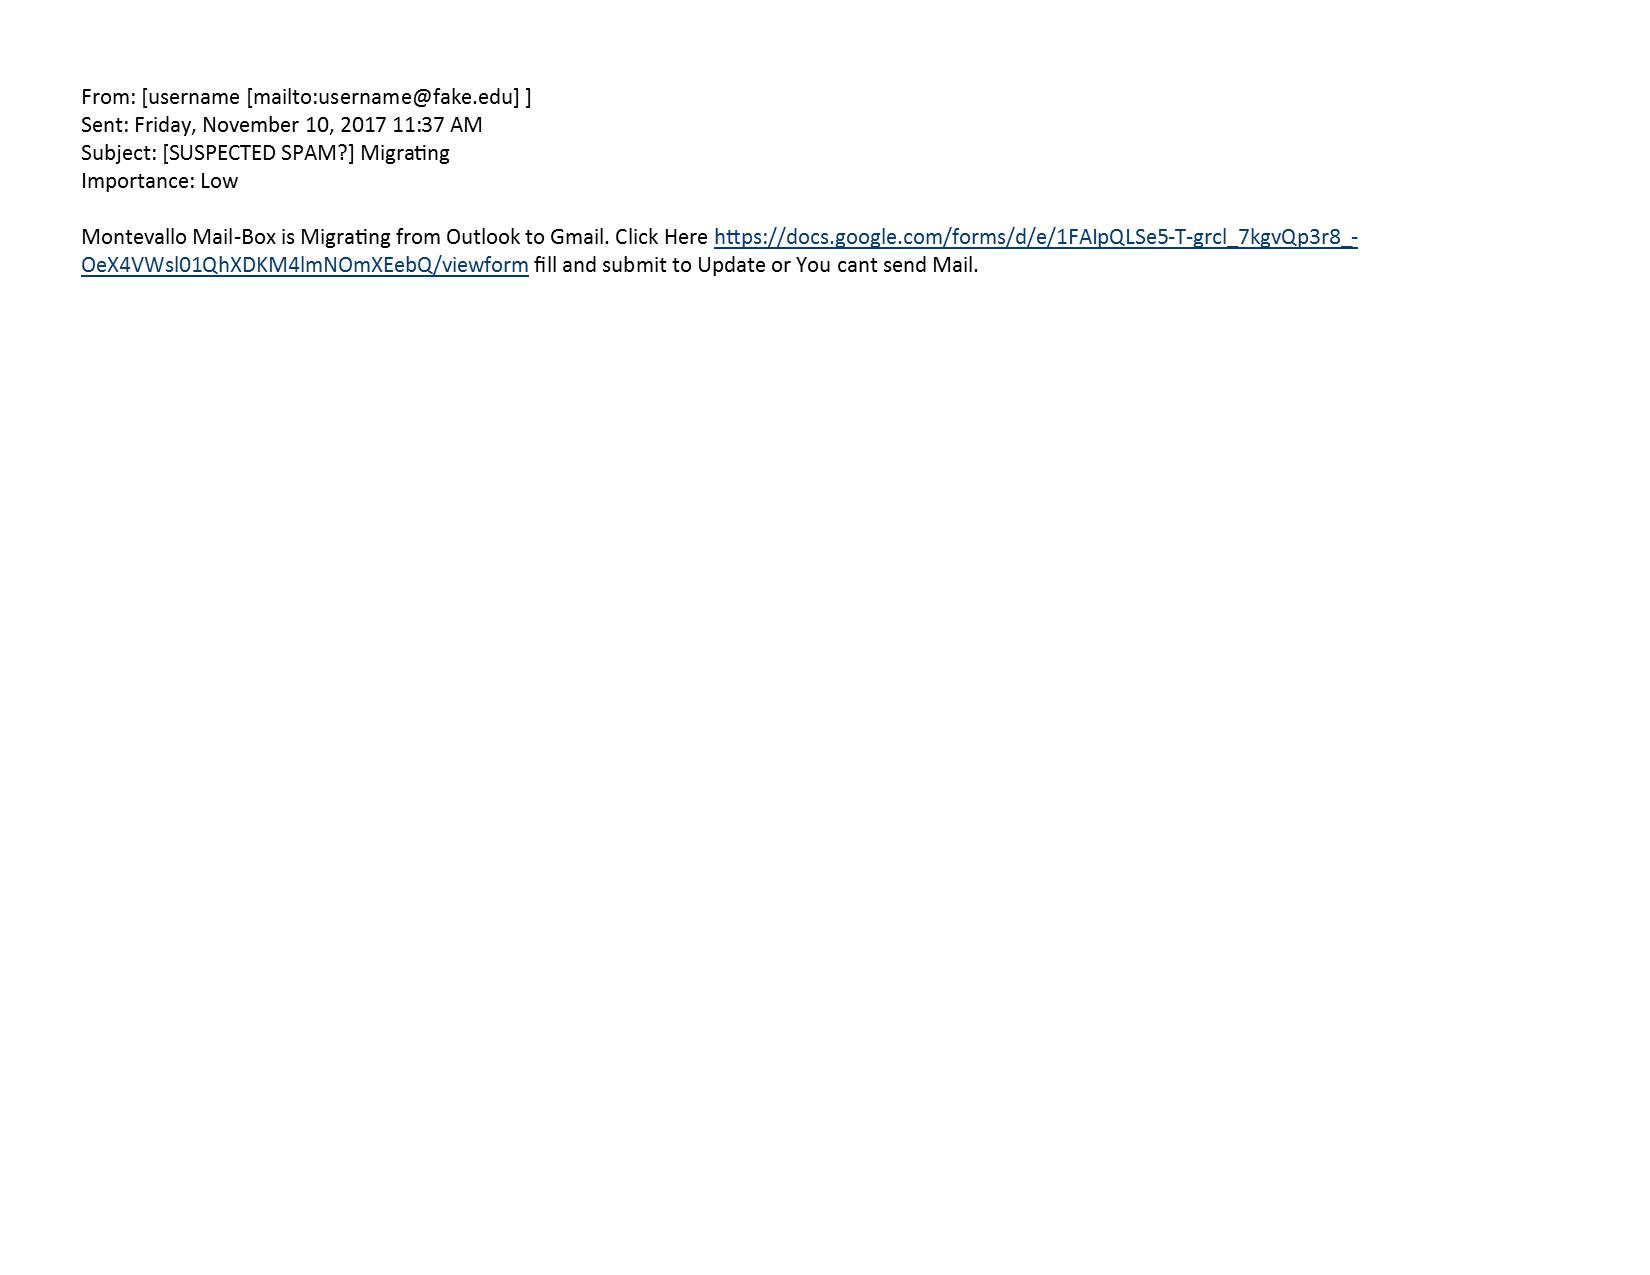 Phishing_11_10_17 - The University of Montevallo